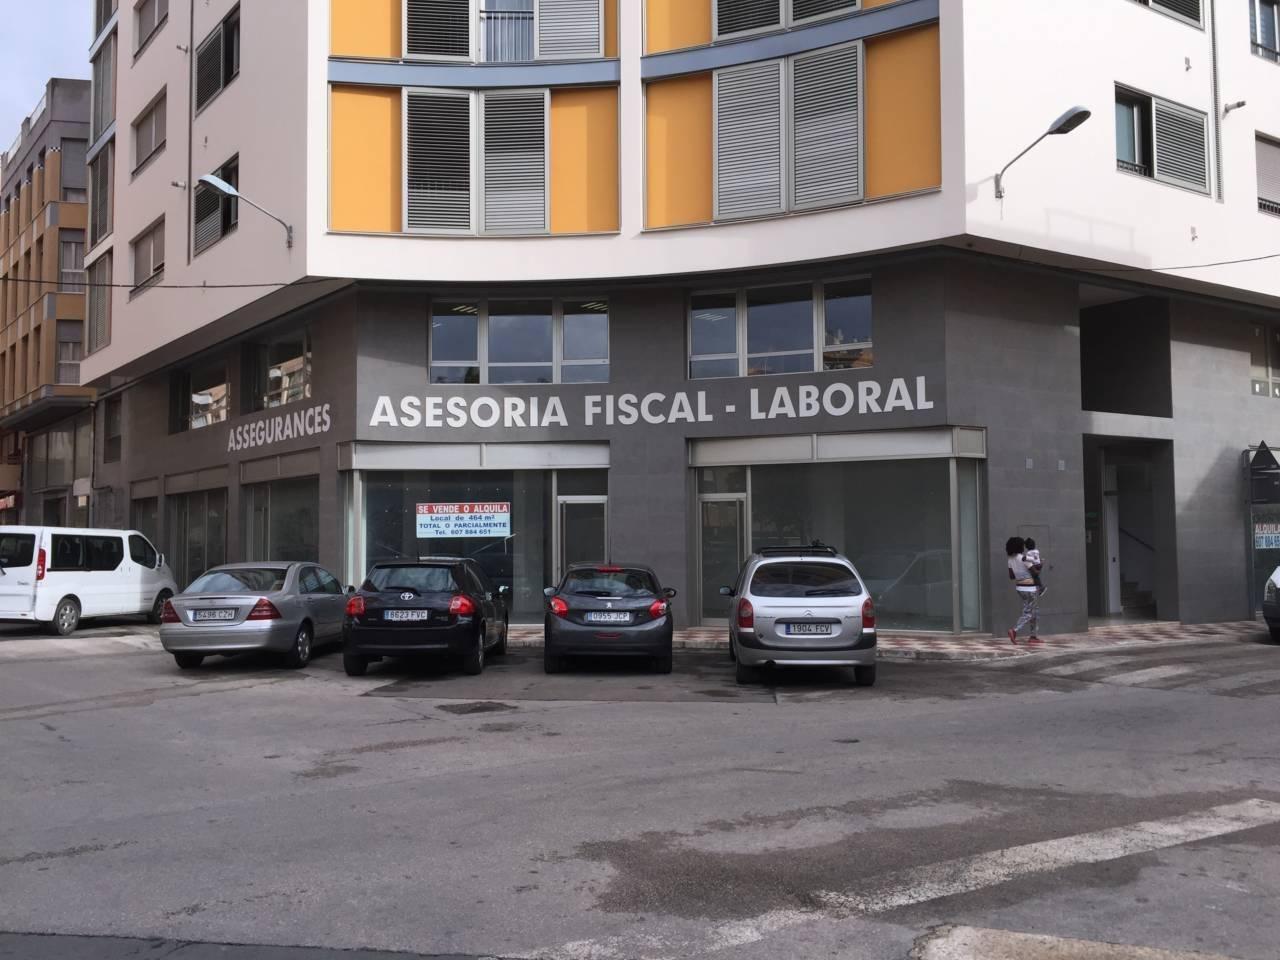 Business premise  Calle valencia/ levante. Superf. 461.63 m², 464 m² solar, accesibilidad, tipo de negocio